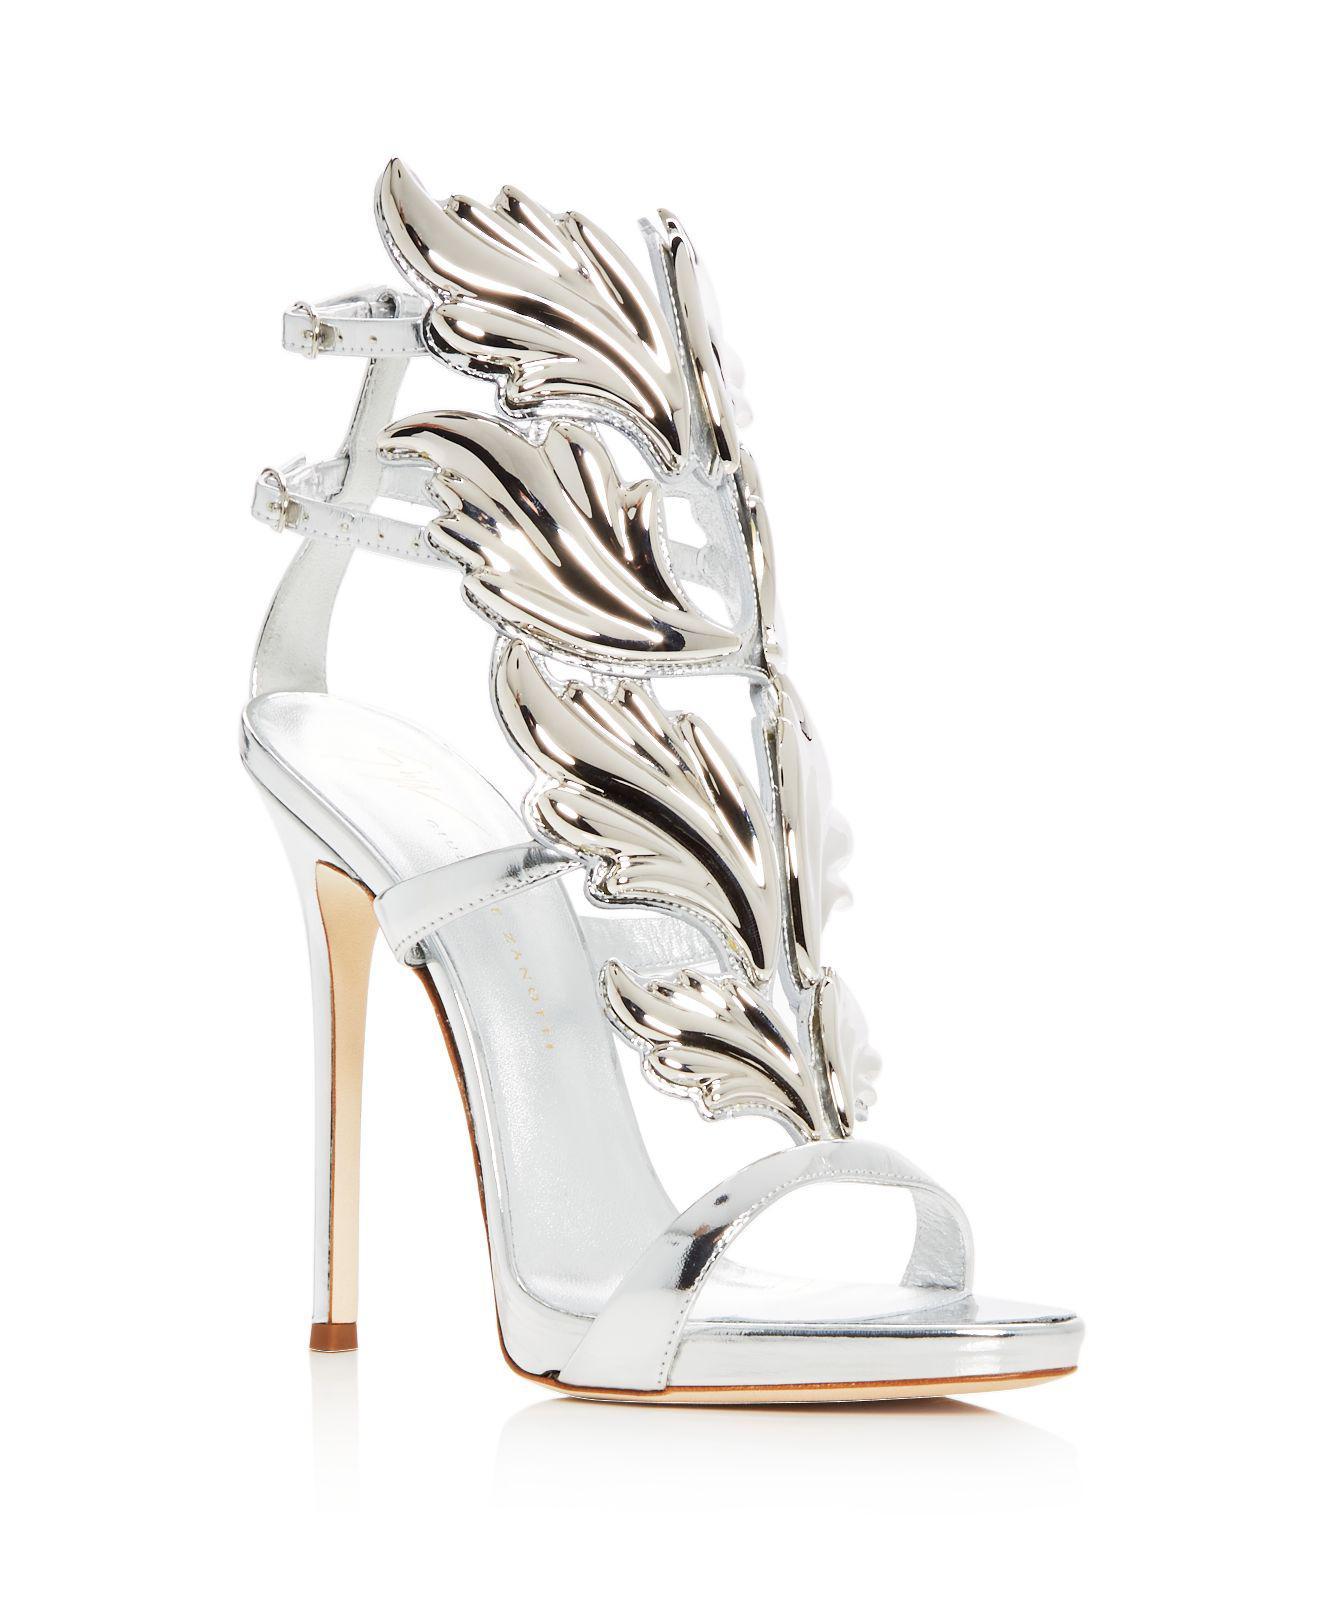 ec632959d7c26 Giuseppe Zanotti Coline Cruel Wing Embellished Patent Sandals | HEWI London